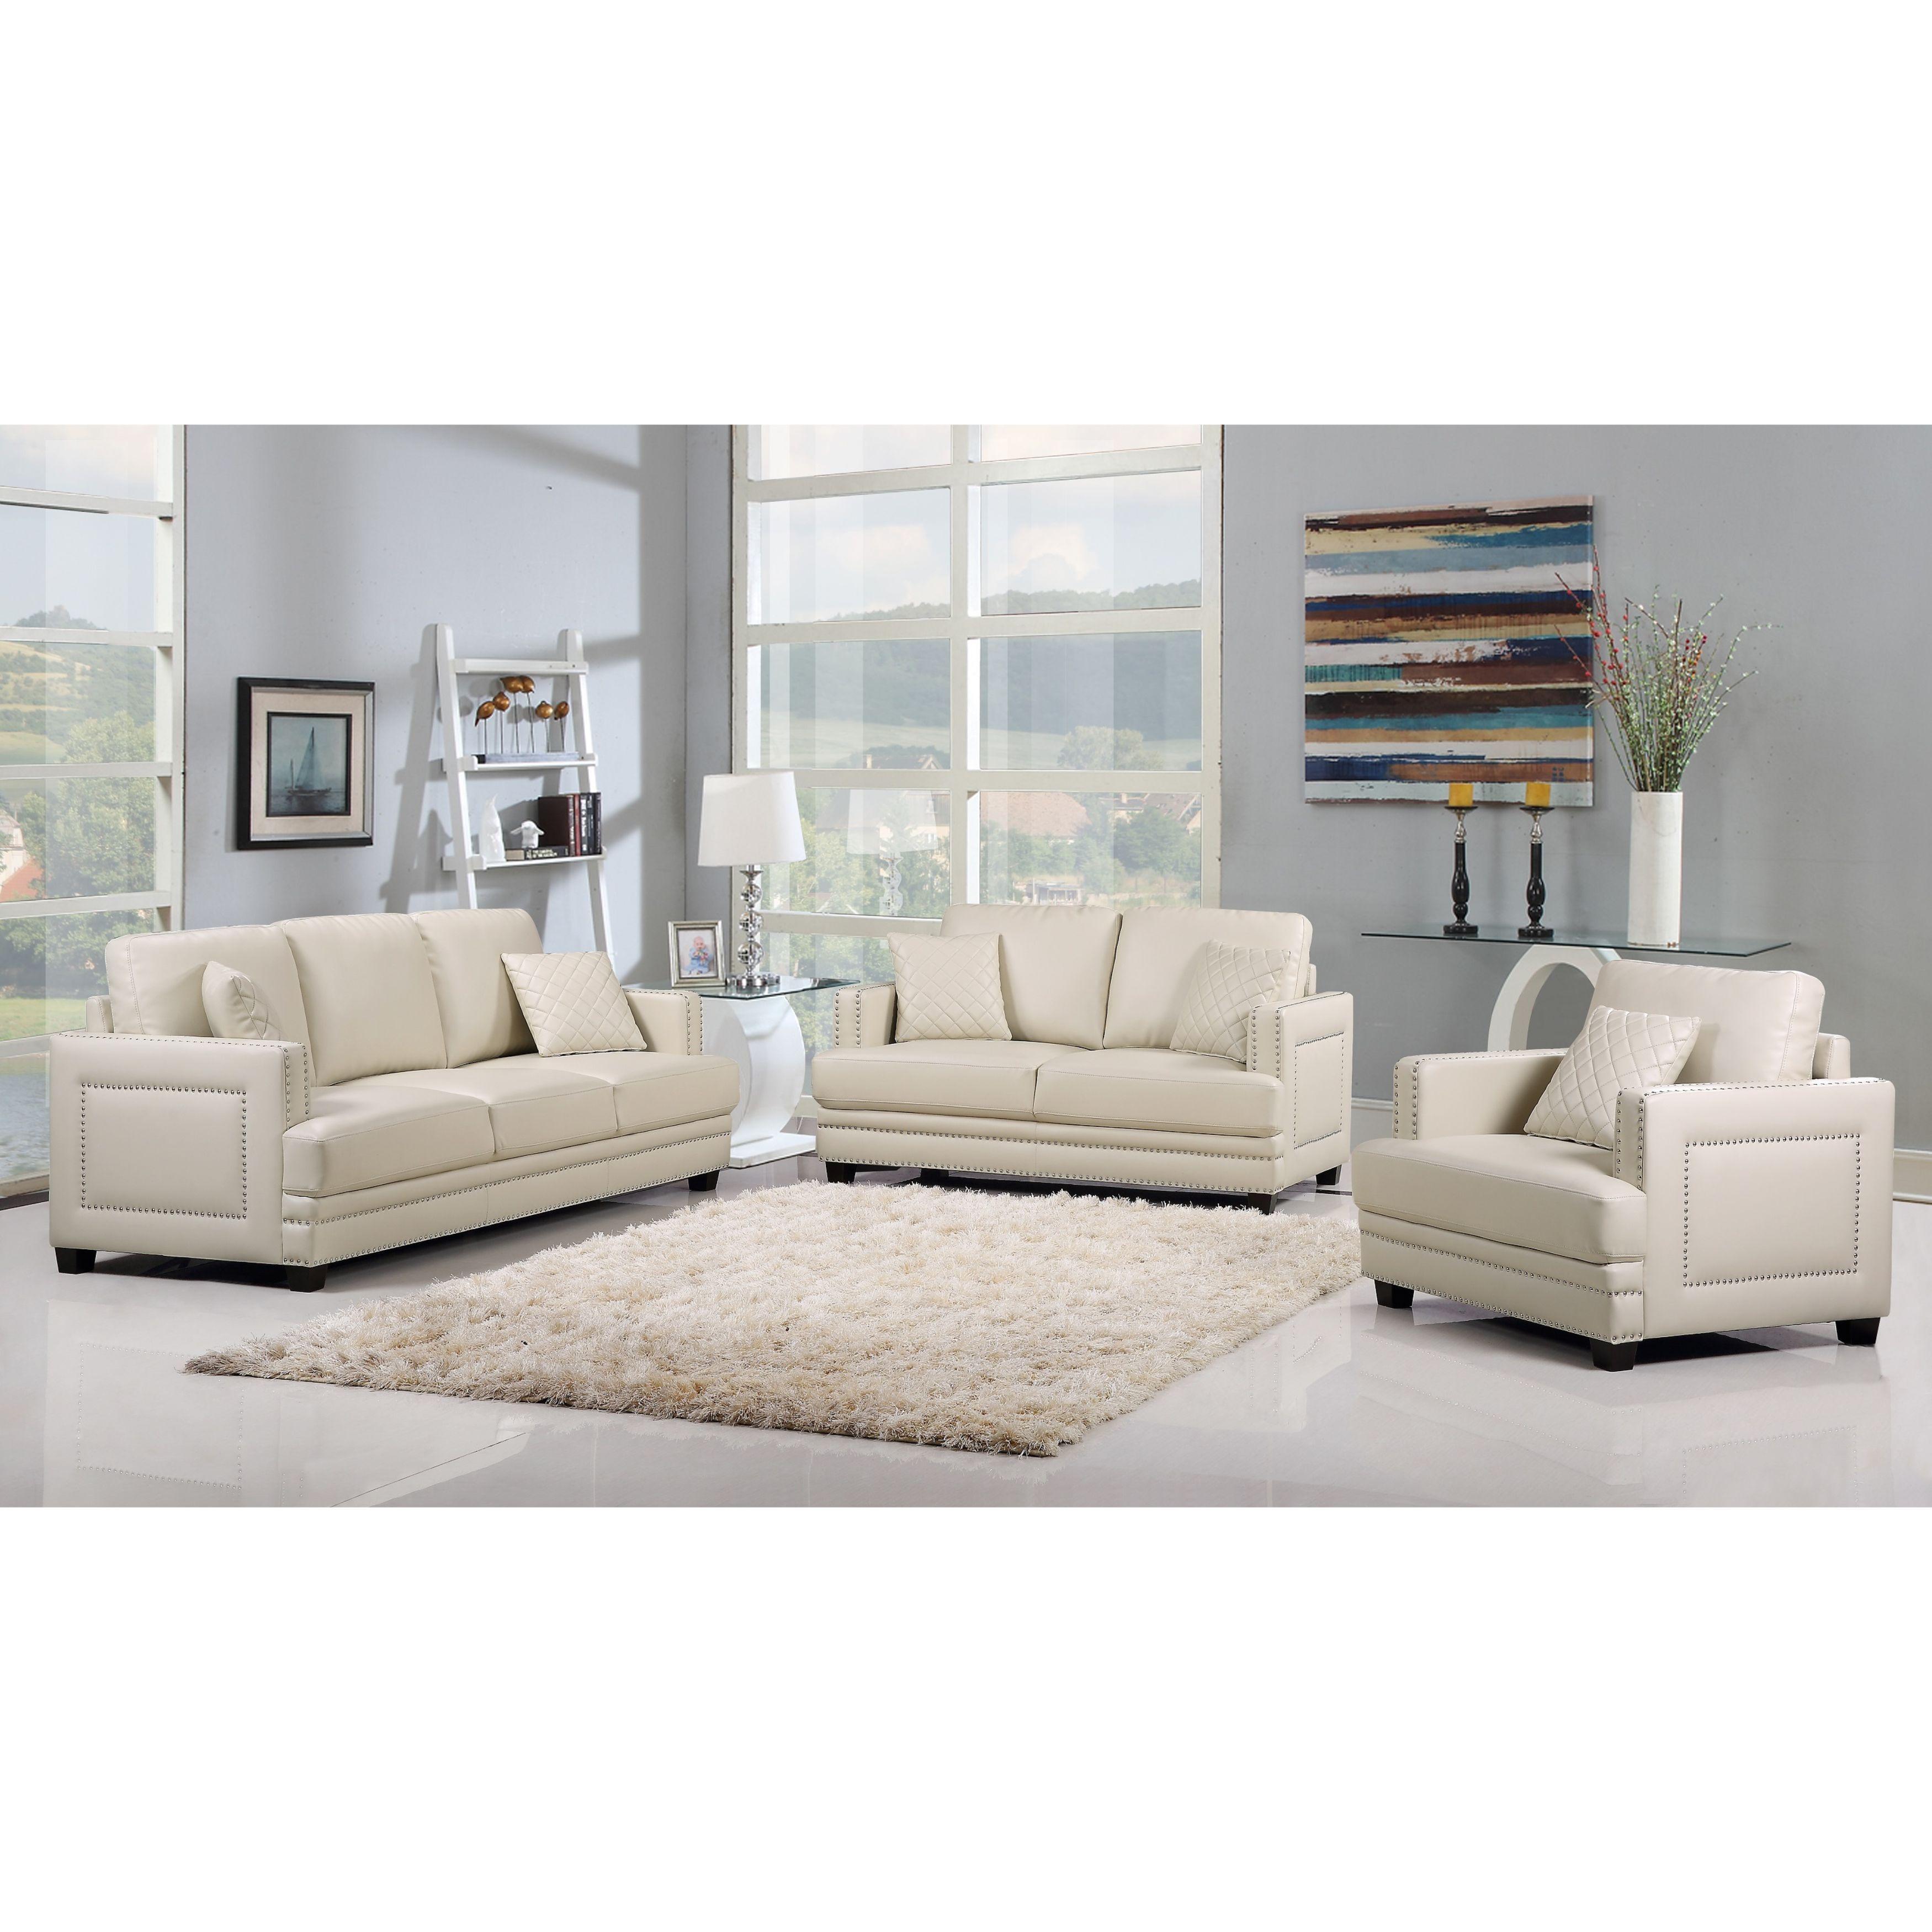 Ferrara Beige Leather Nailhead Modern Contemporary Living Room Set Overstock 11023826